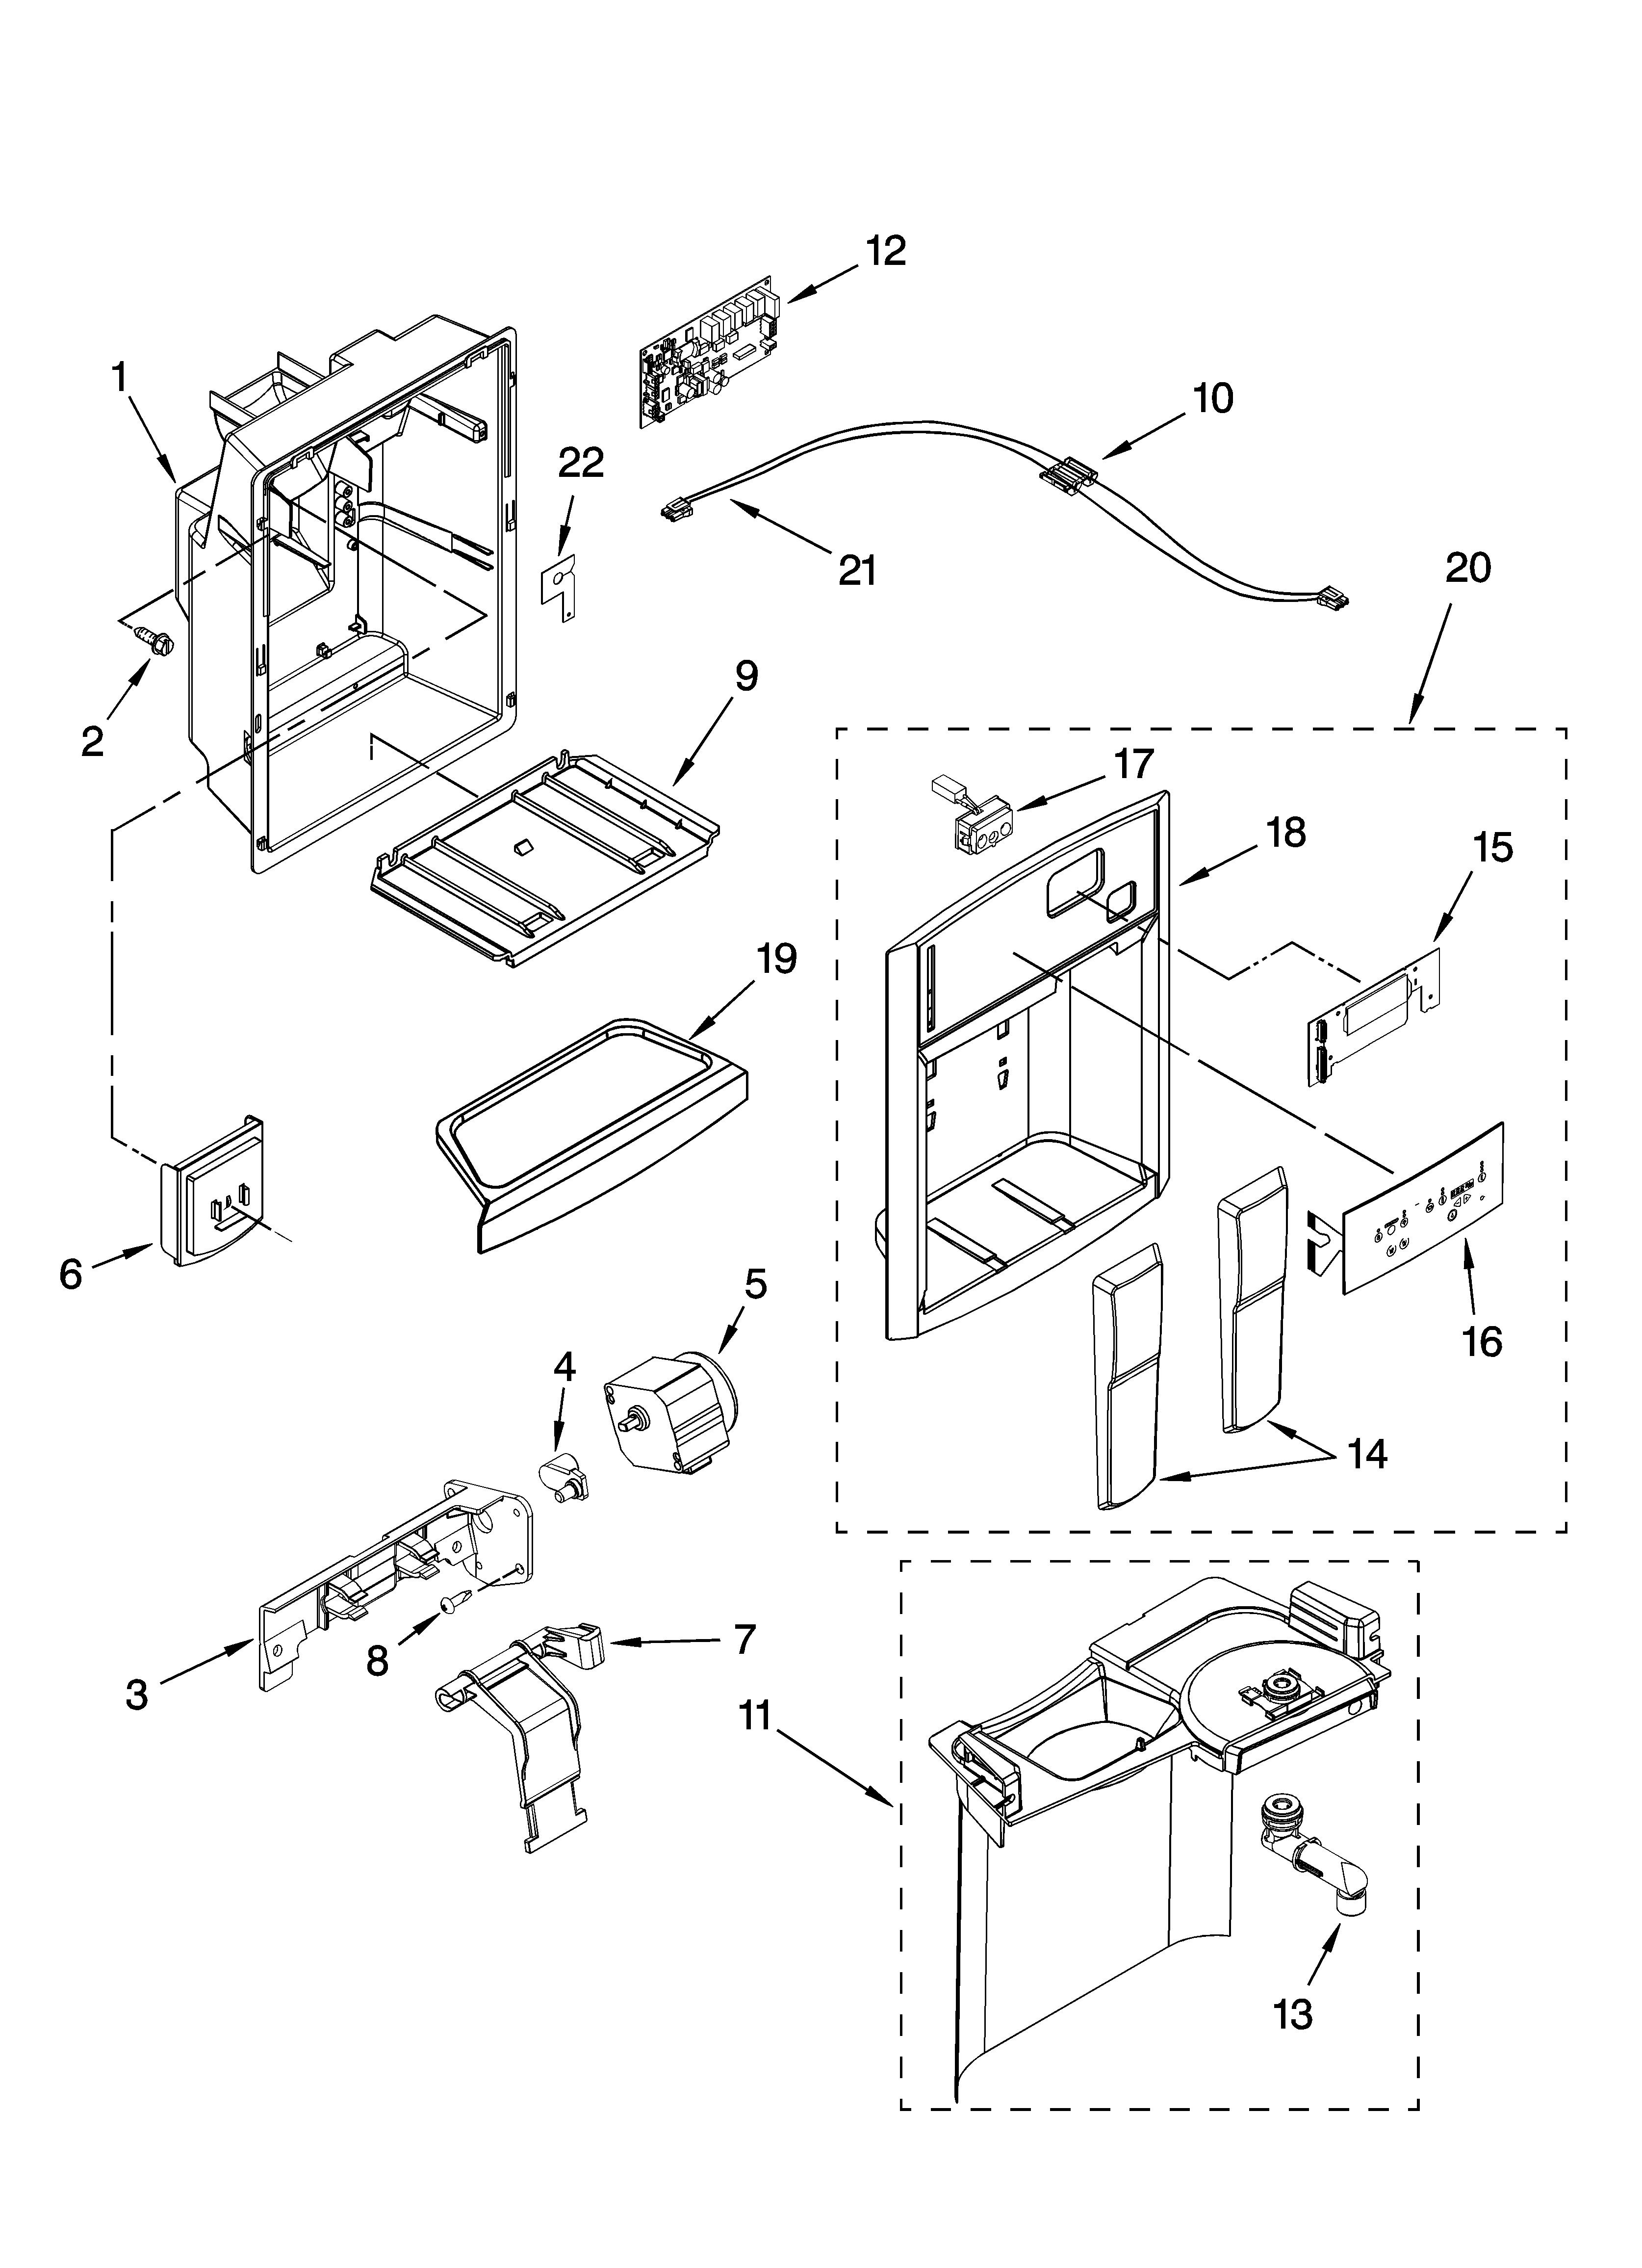 Whirlpool model GC3NHAXVQ00 side-by-side refrigerator